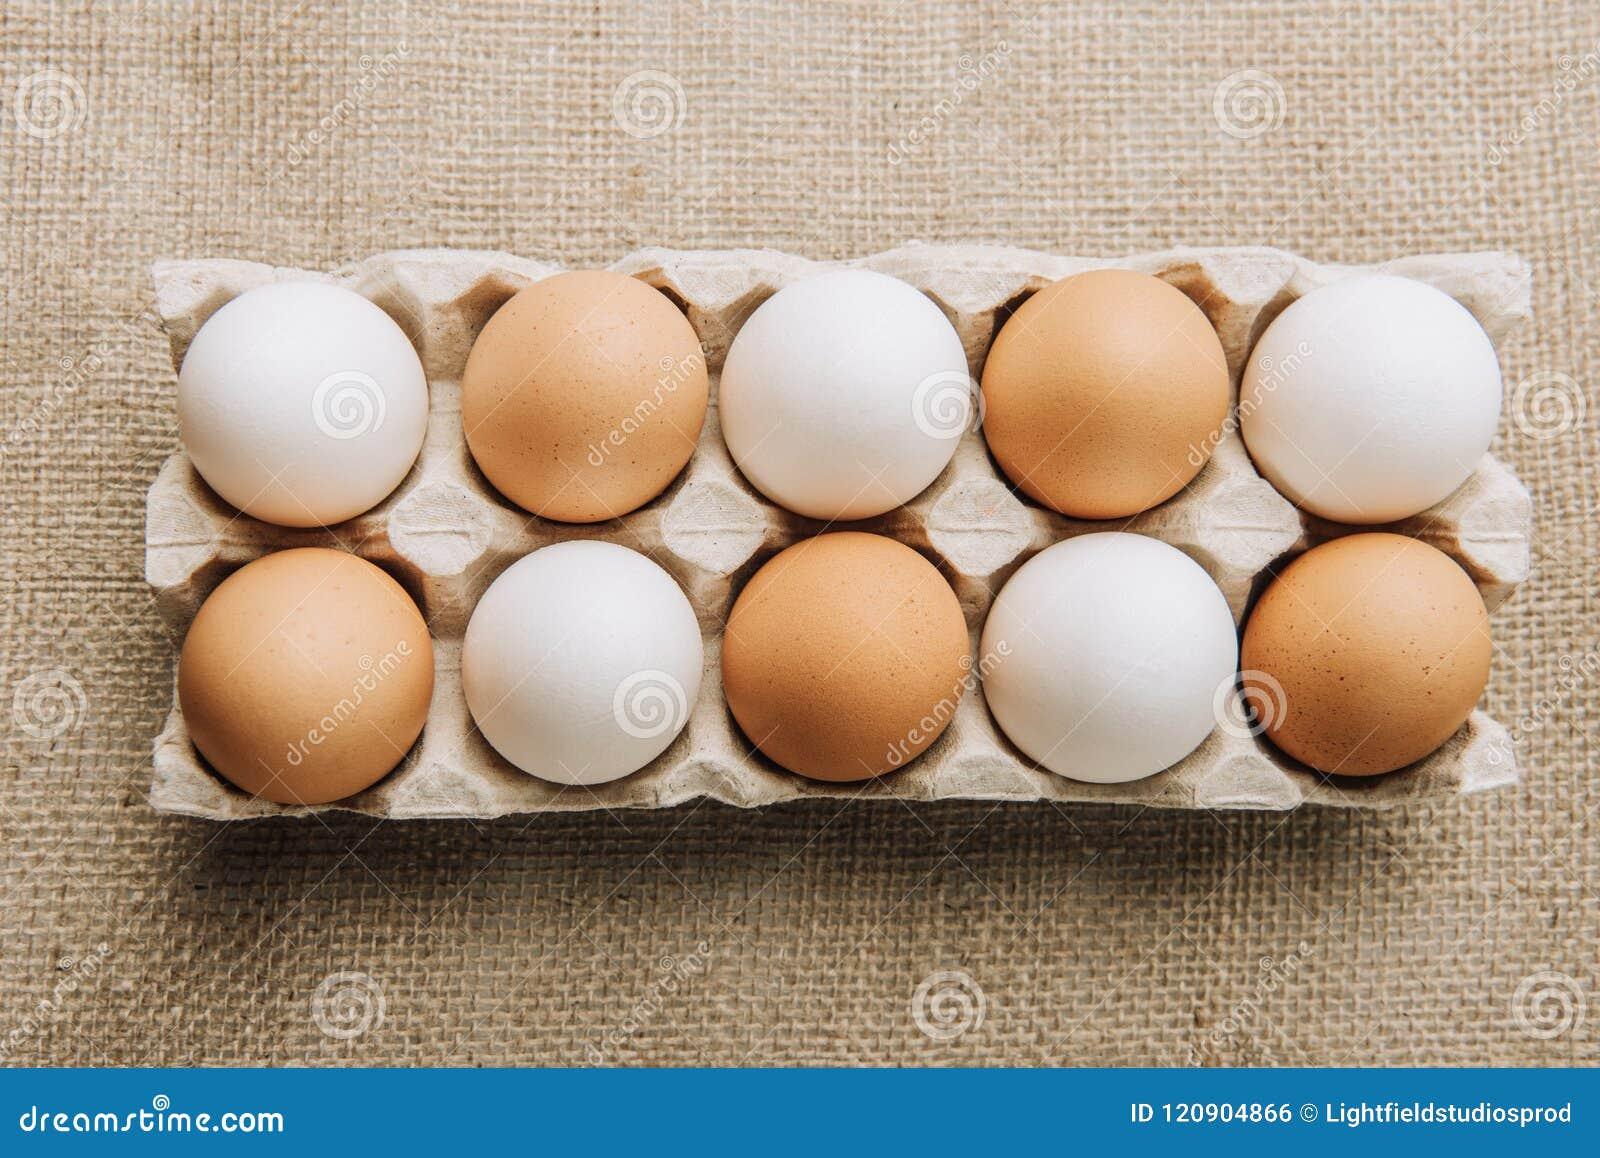 Witte en bruine eieren die in eikarton leggen